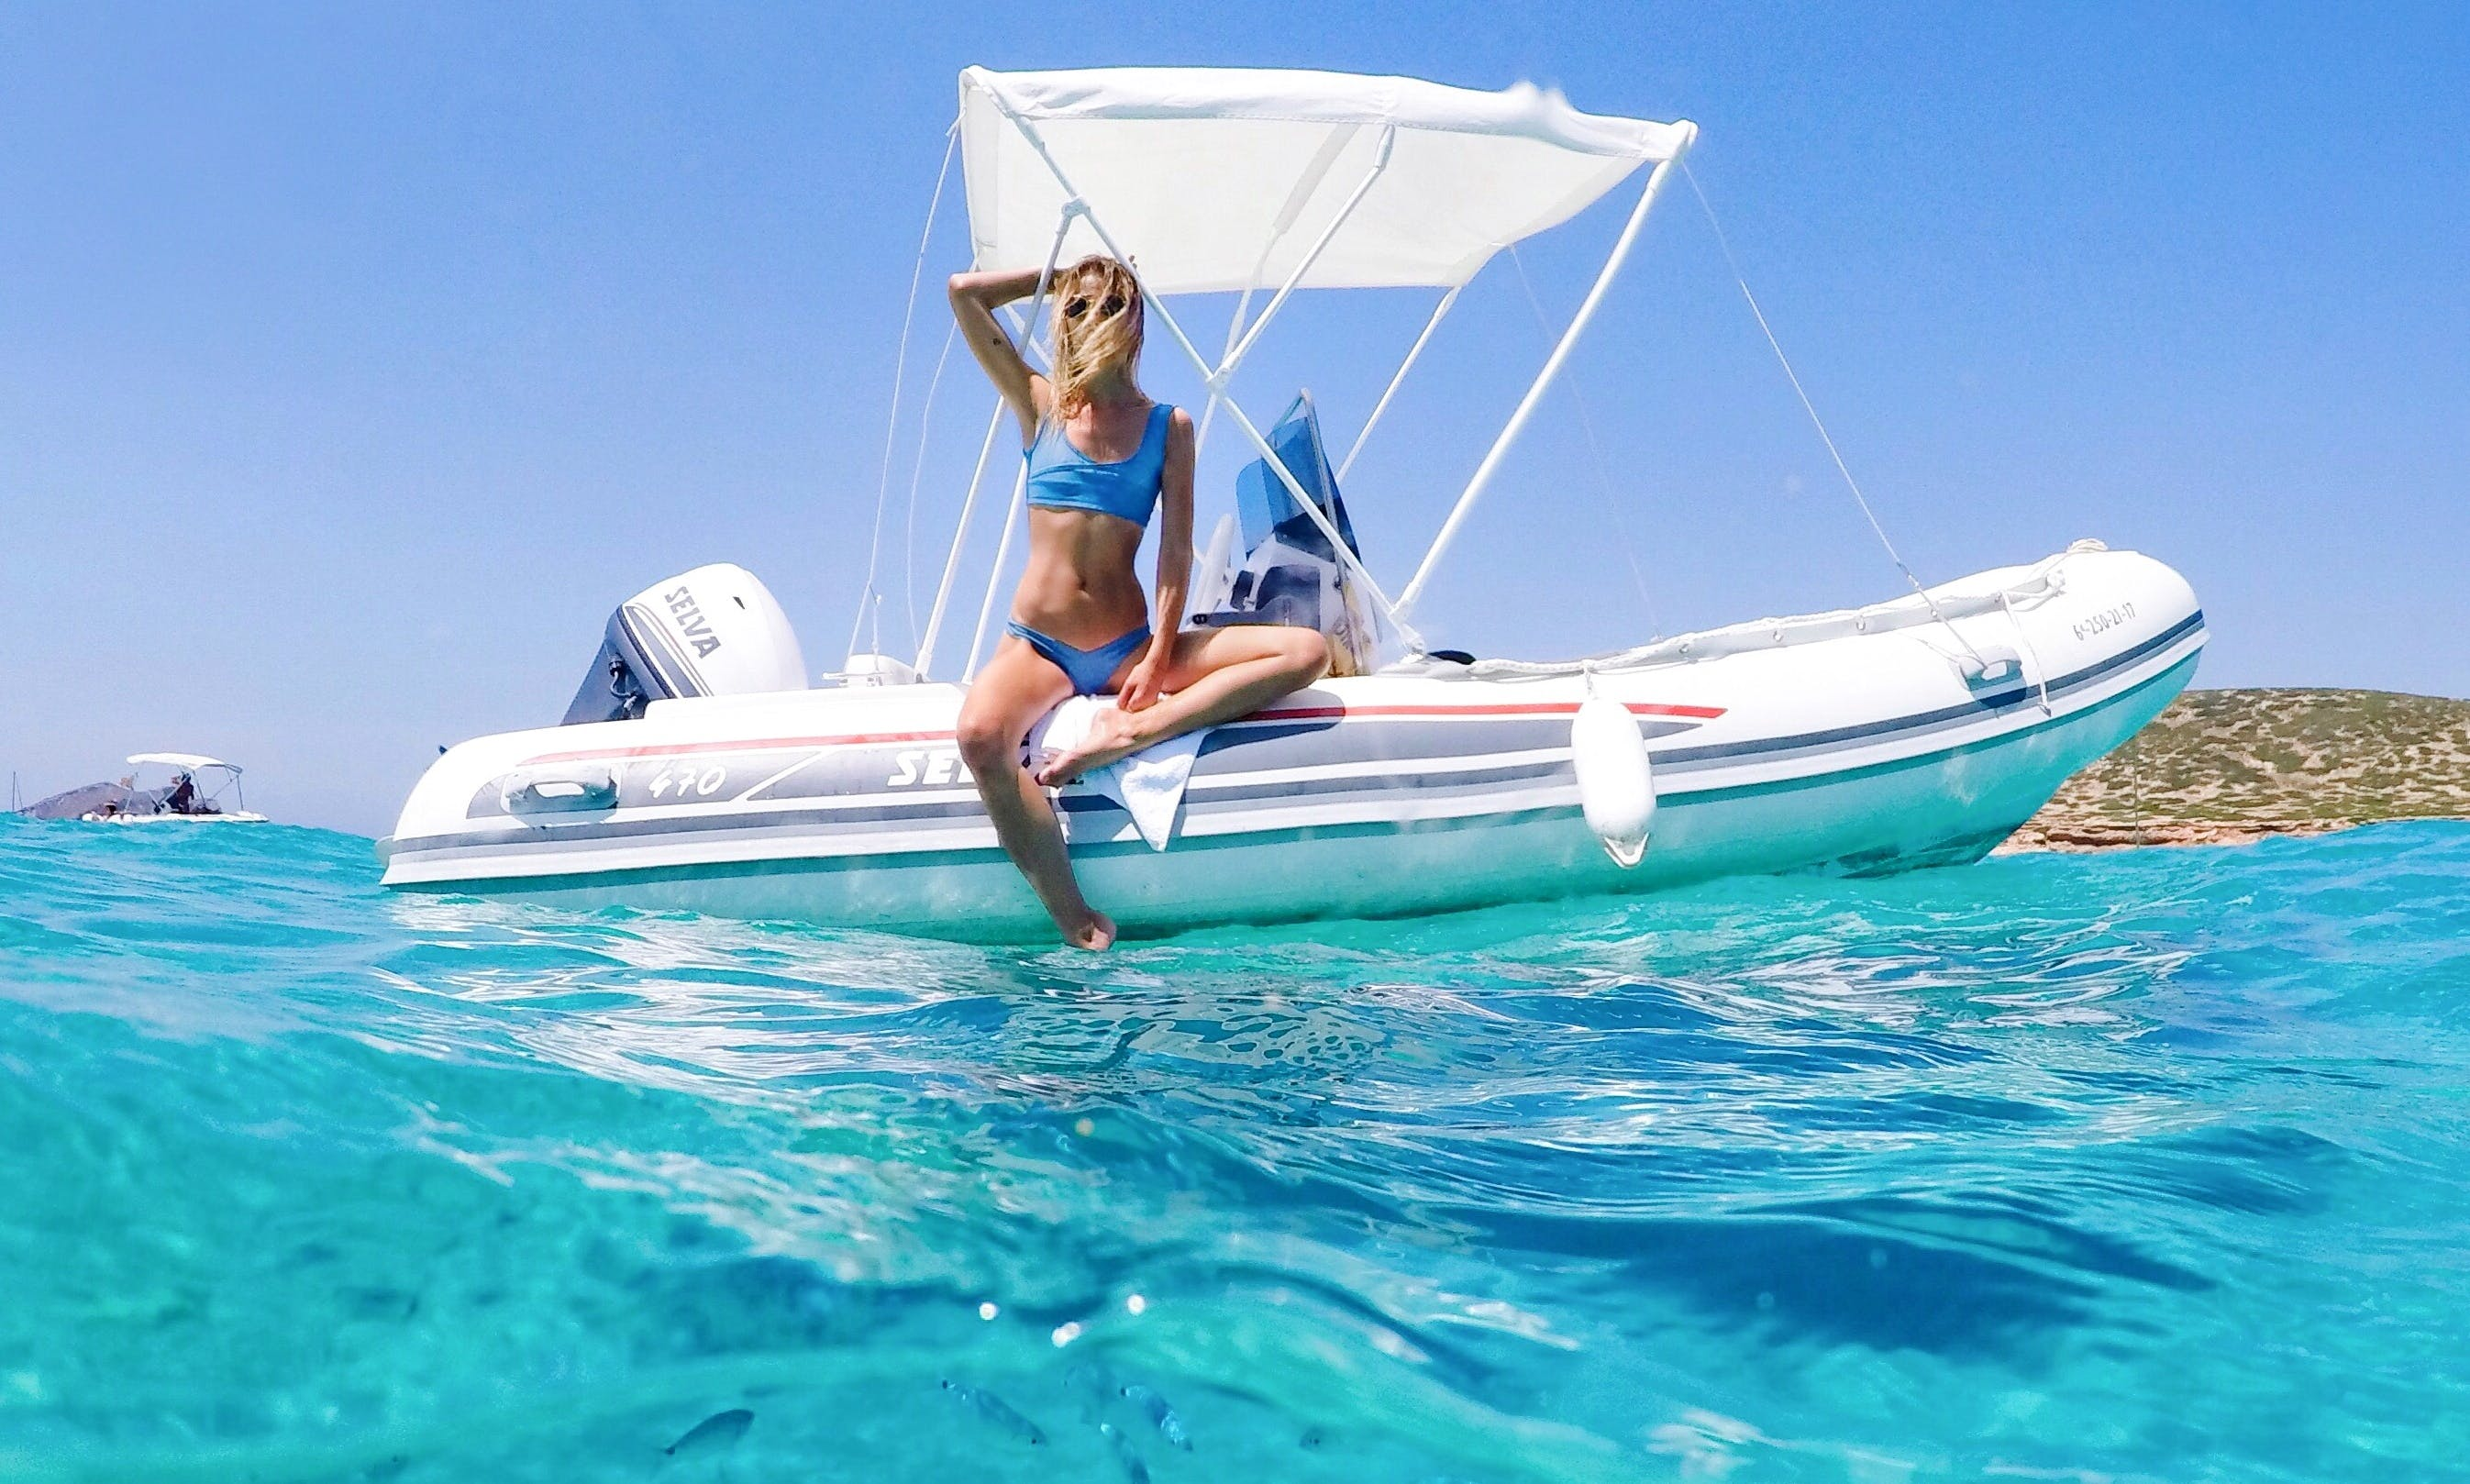 Enjoy an island hopping experience with this RIB rental in Sant Antoni de Portmany, Spain